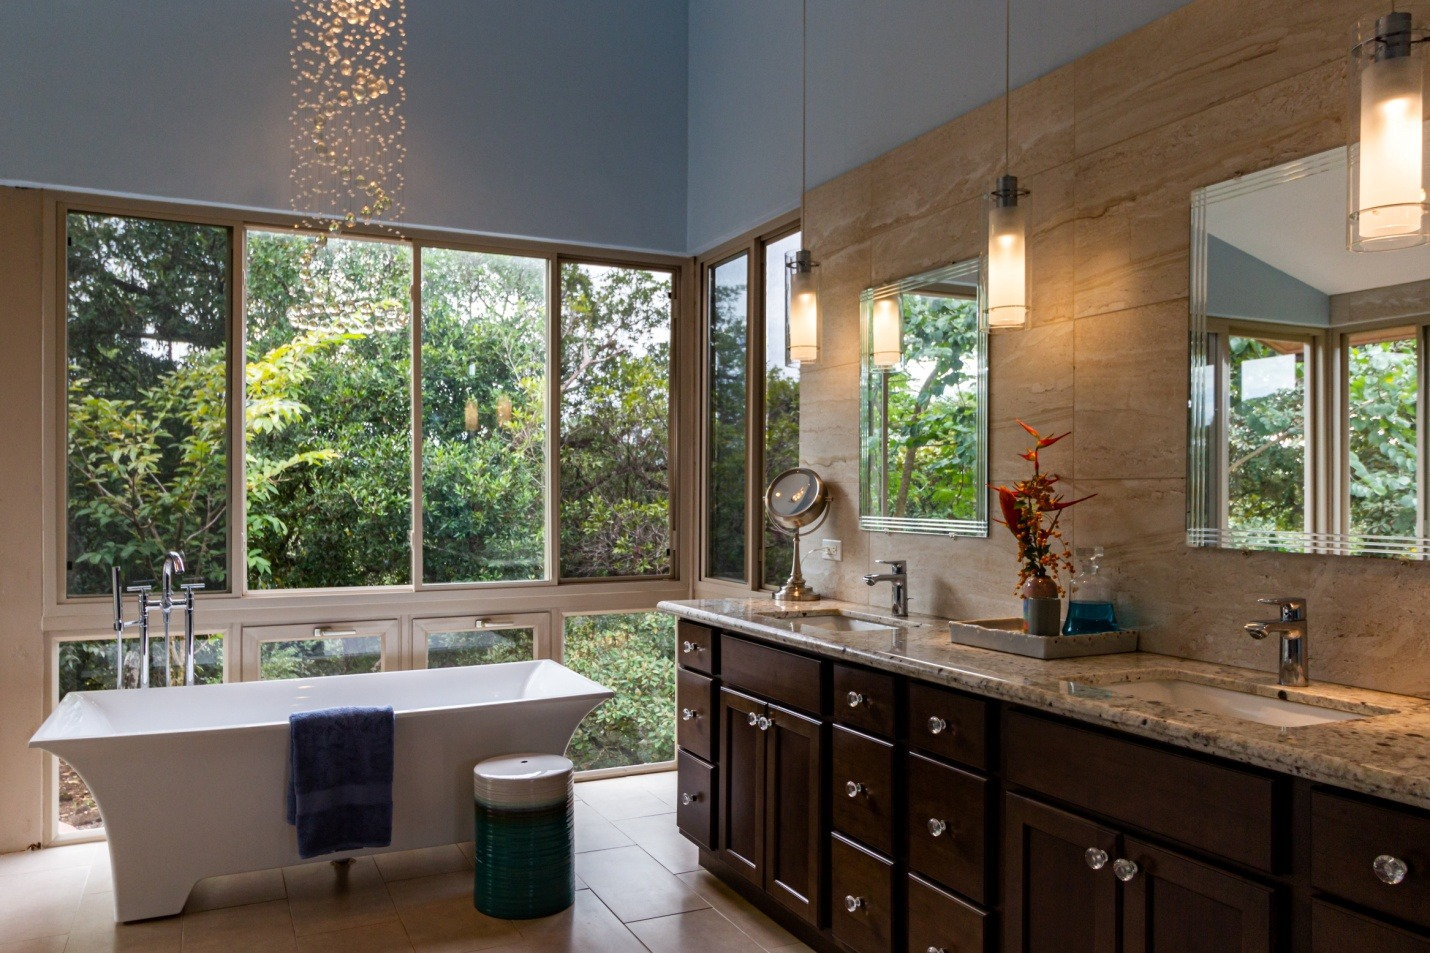 Freestanding Bathtub With Overhead Shower